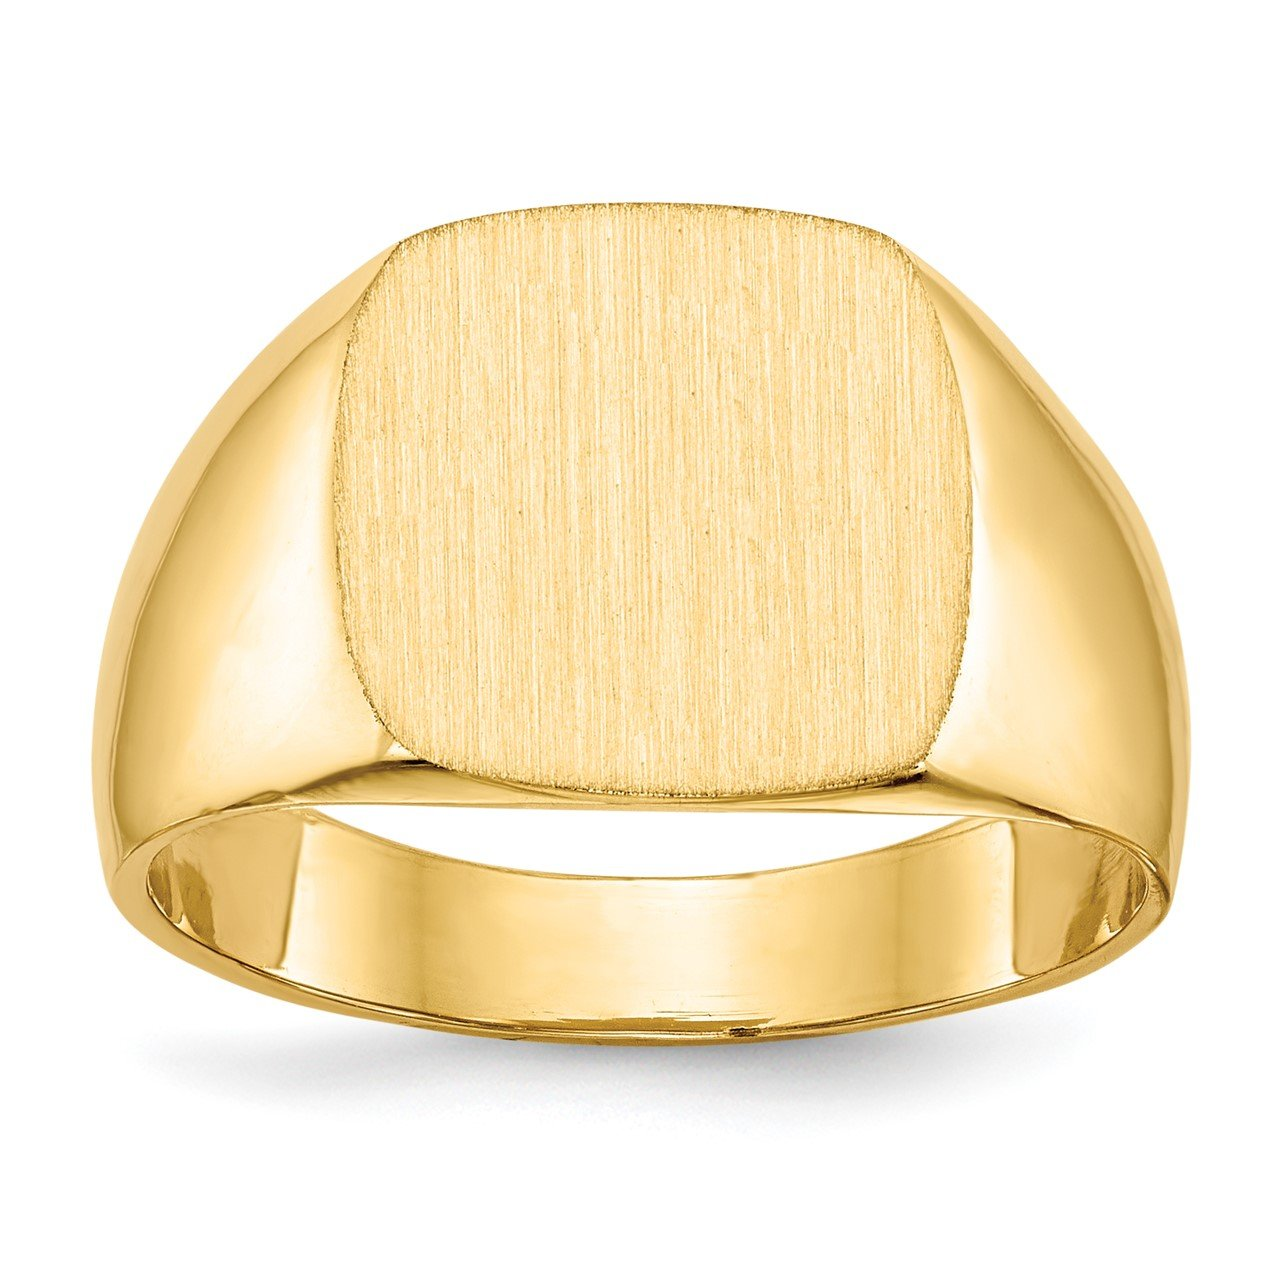 14k 12.0x13.0mm Closed Back Men's Signet Ring